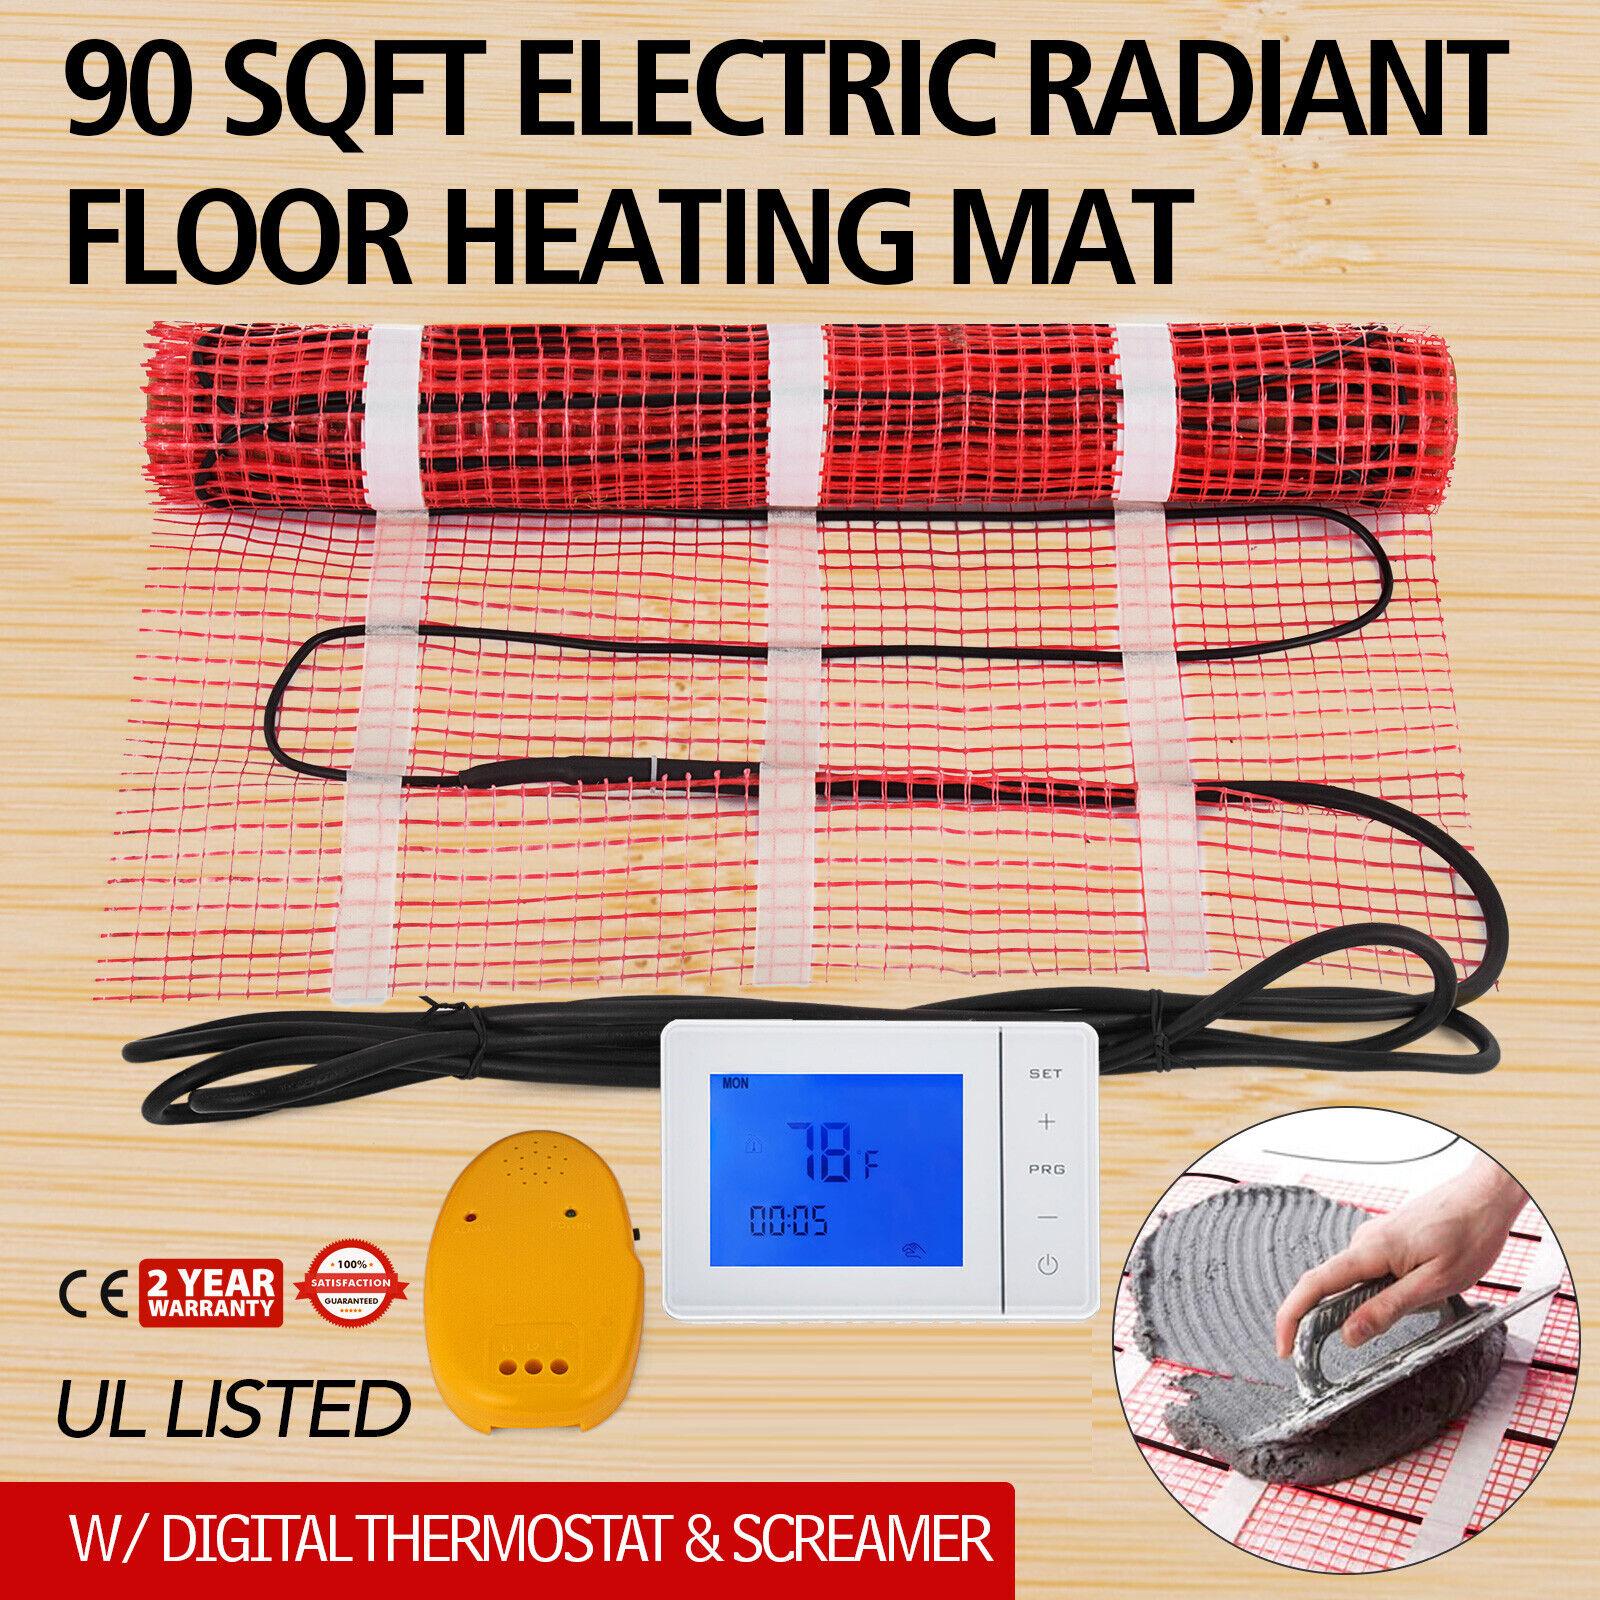 ELECTRIC RADIANT WARM  FLOOR TILE HEAT SYSTEM 60 Sqft 240V THERMOSTAT